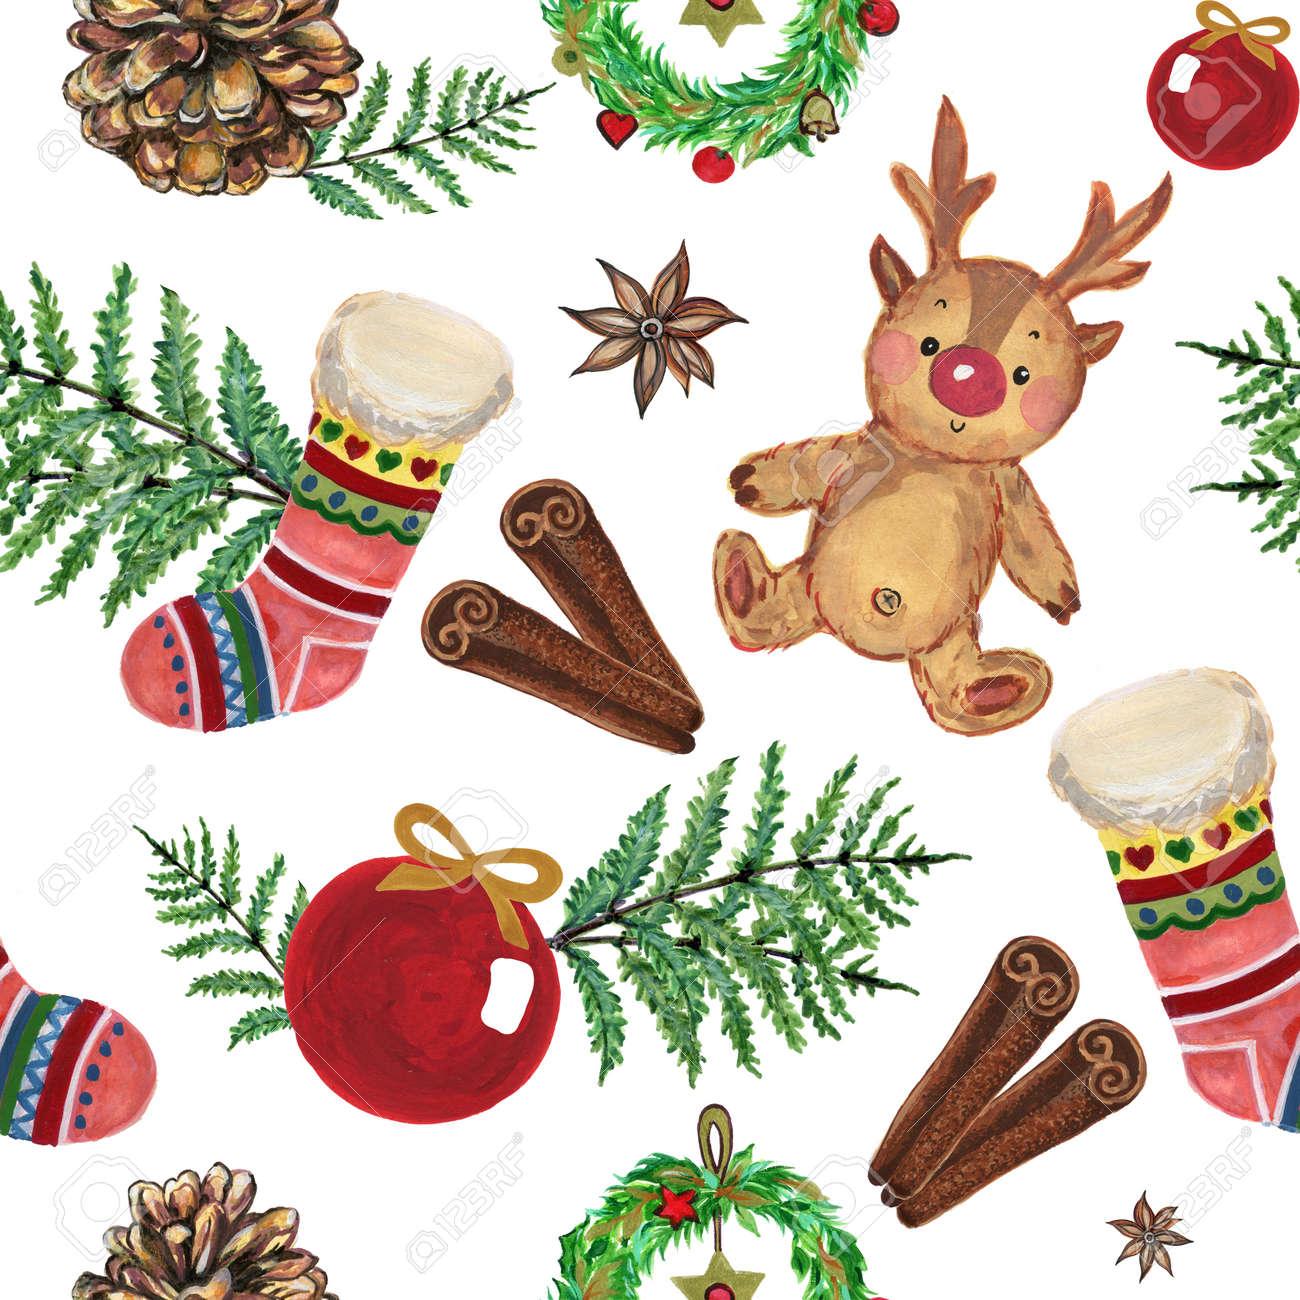 Vintage Christmas Illustrations.Stock Illustration